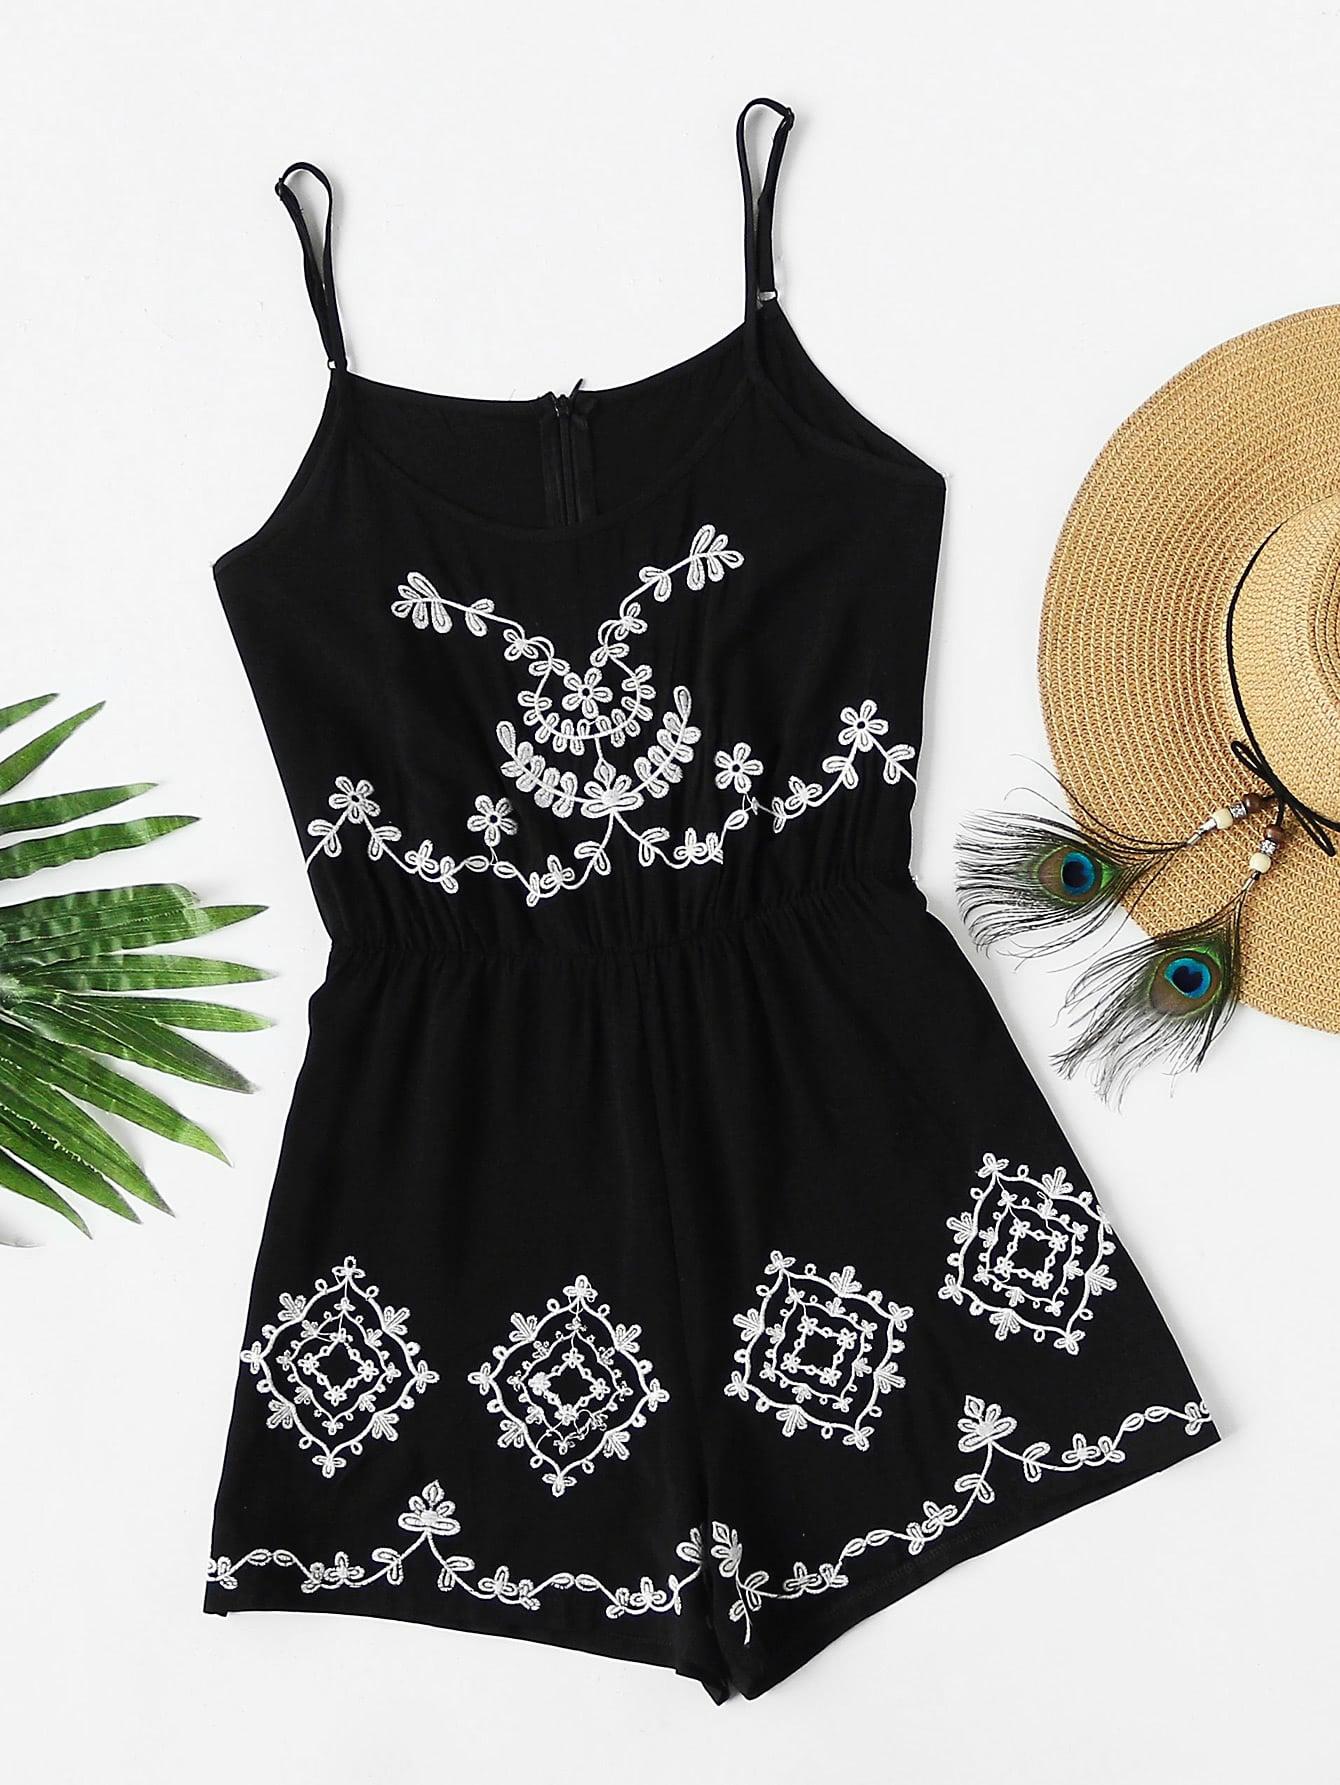 Фото Flower Embroidered Cami Romper With Zipper Back. Купить с доставкой